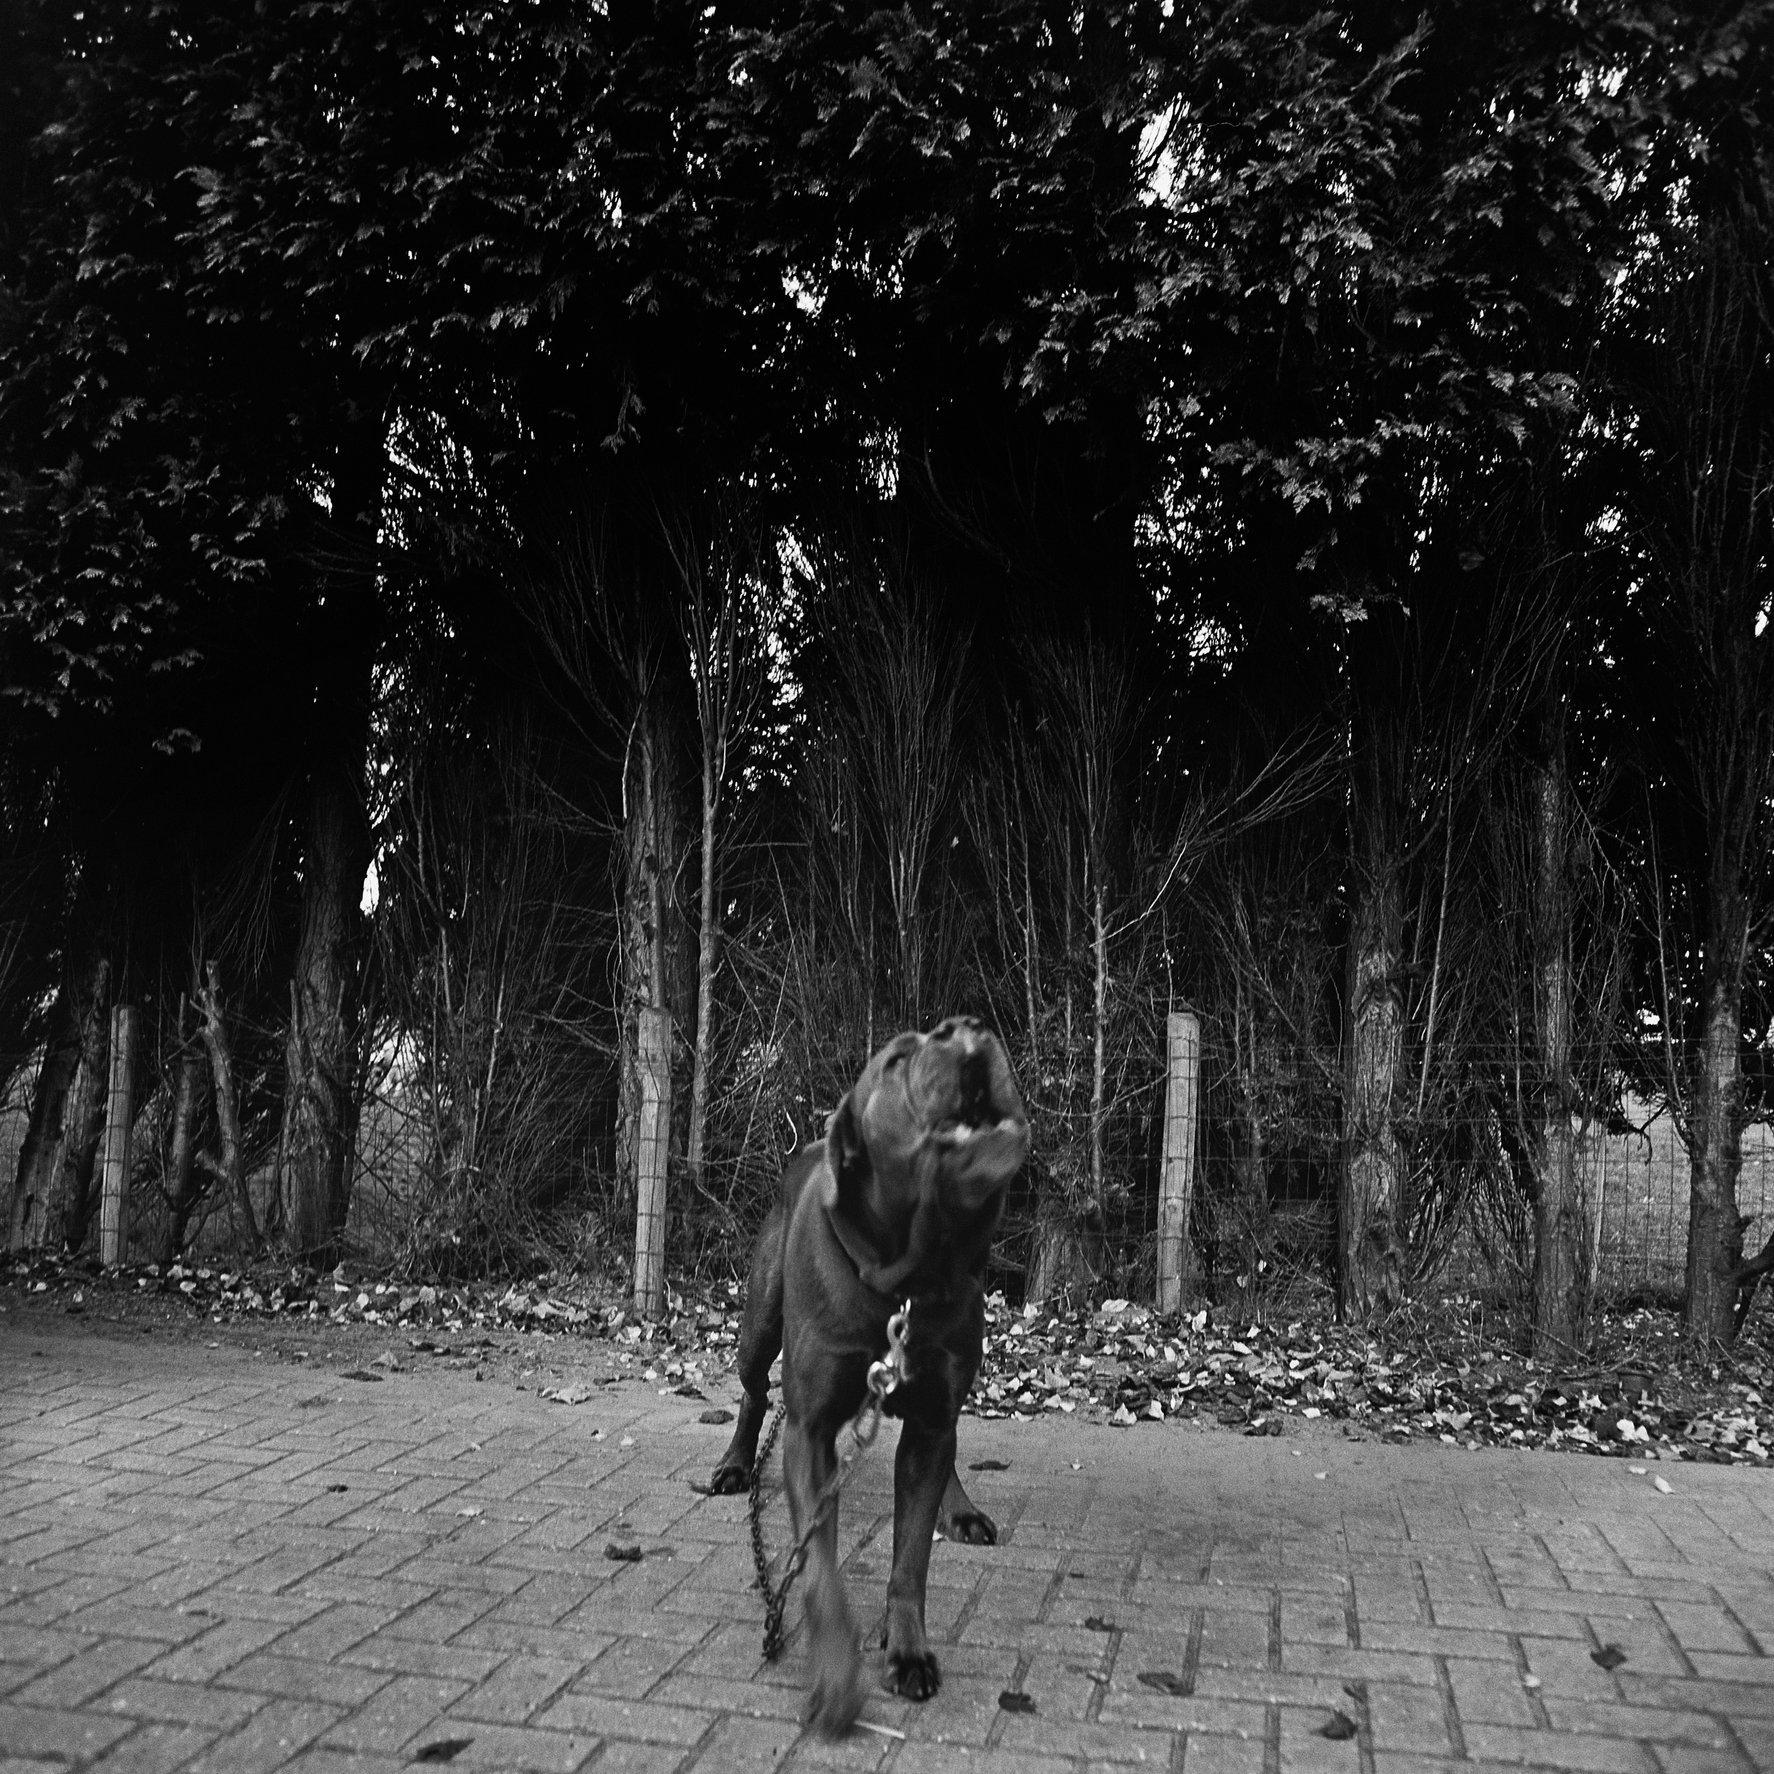 hond - 2006-03-21 at 13-55-32.jpg